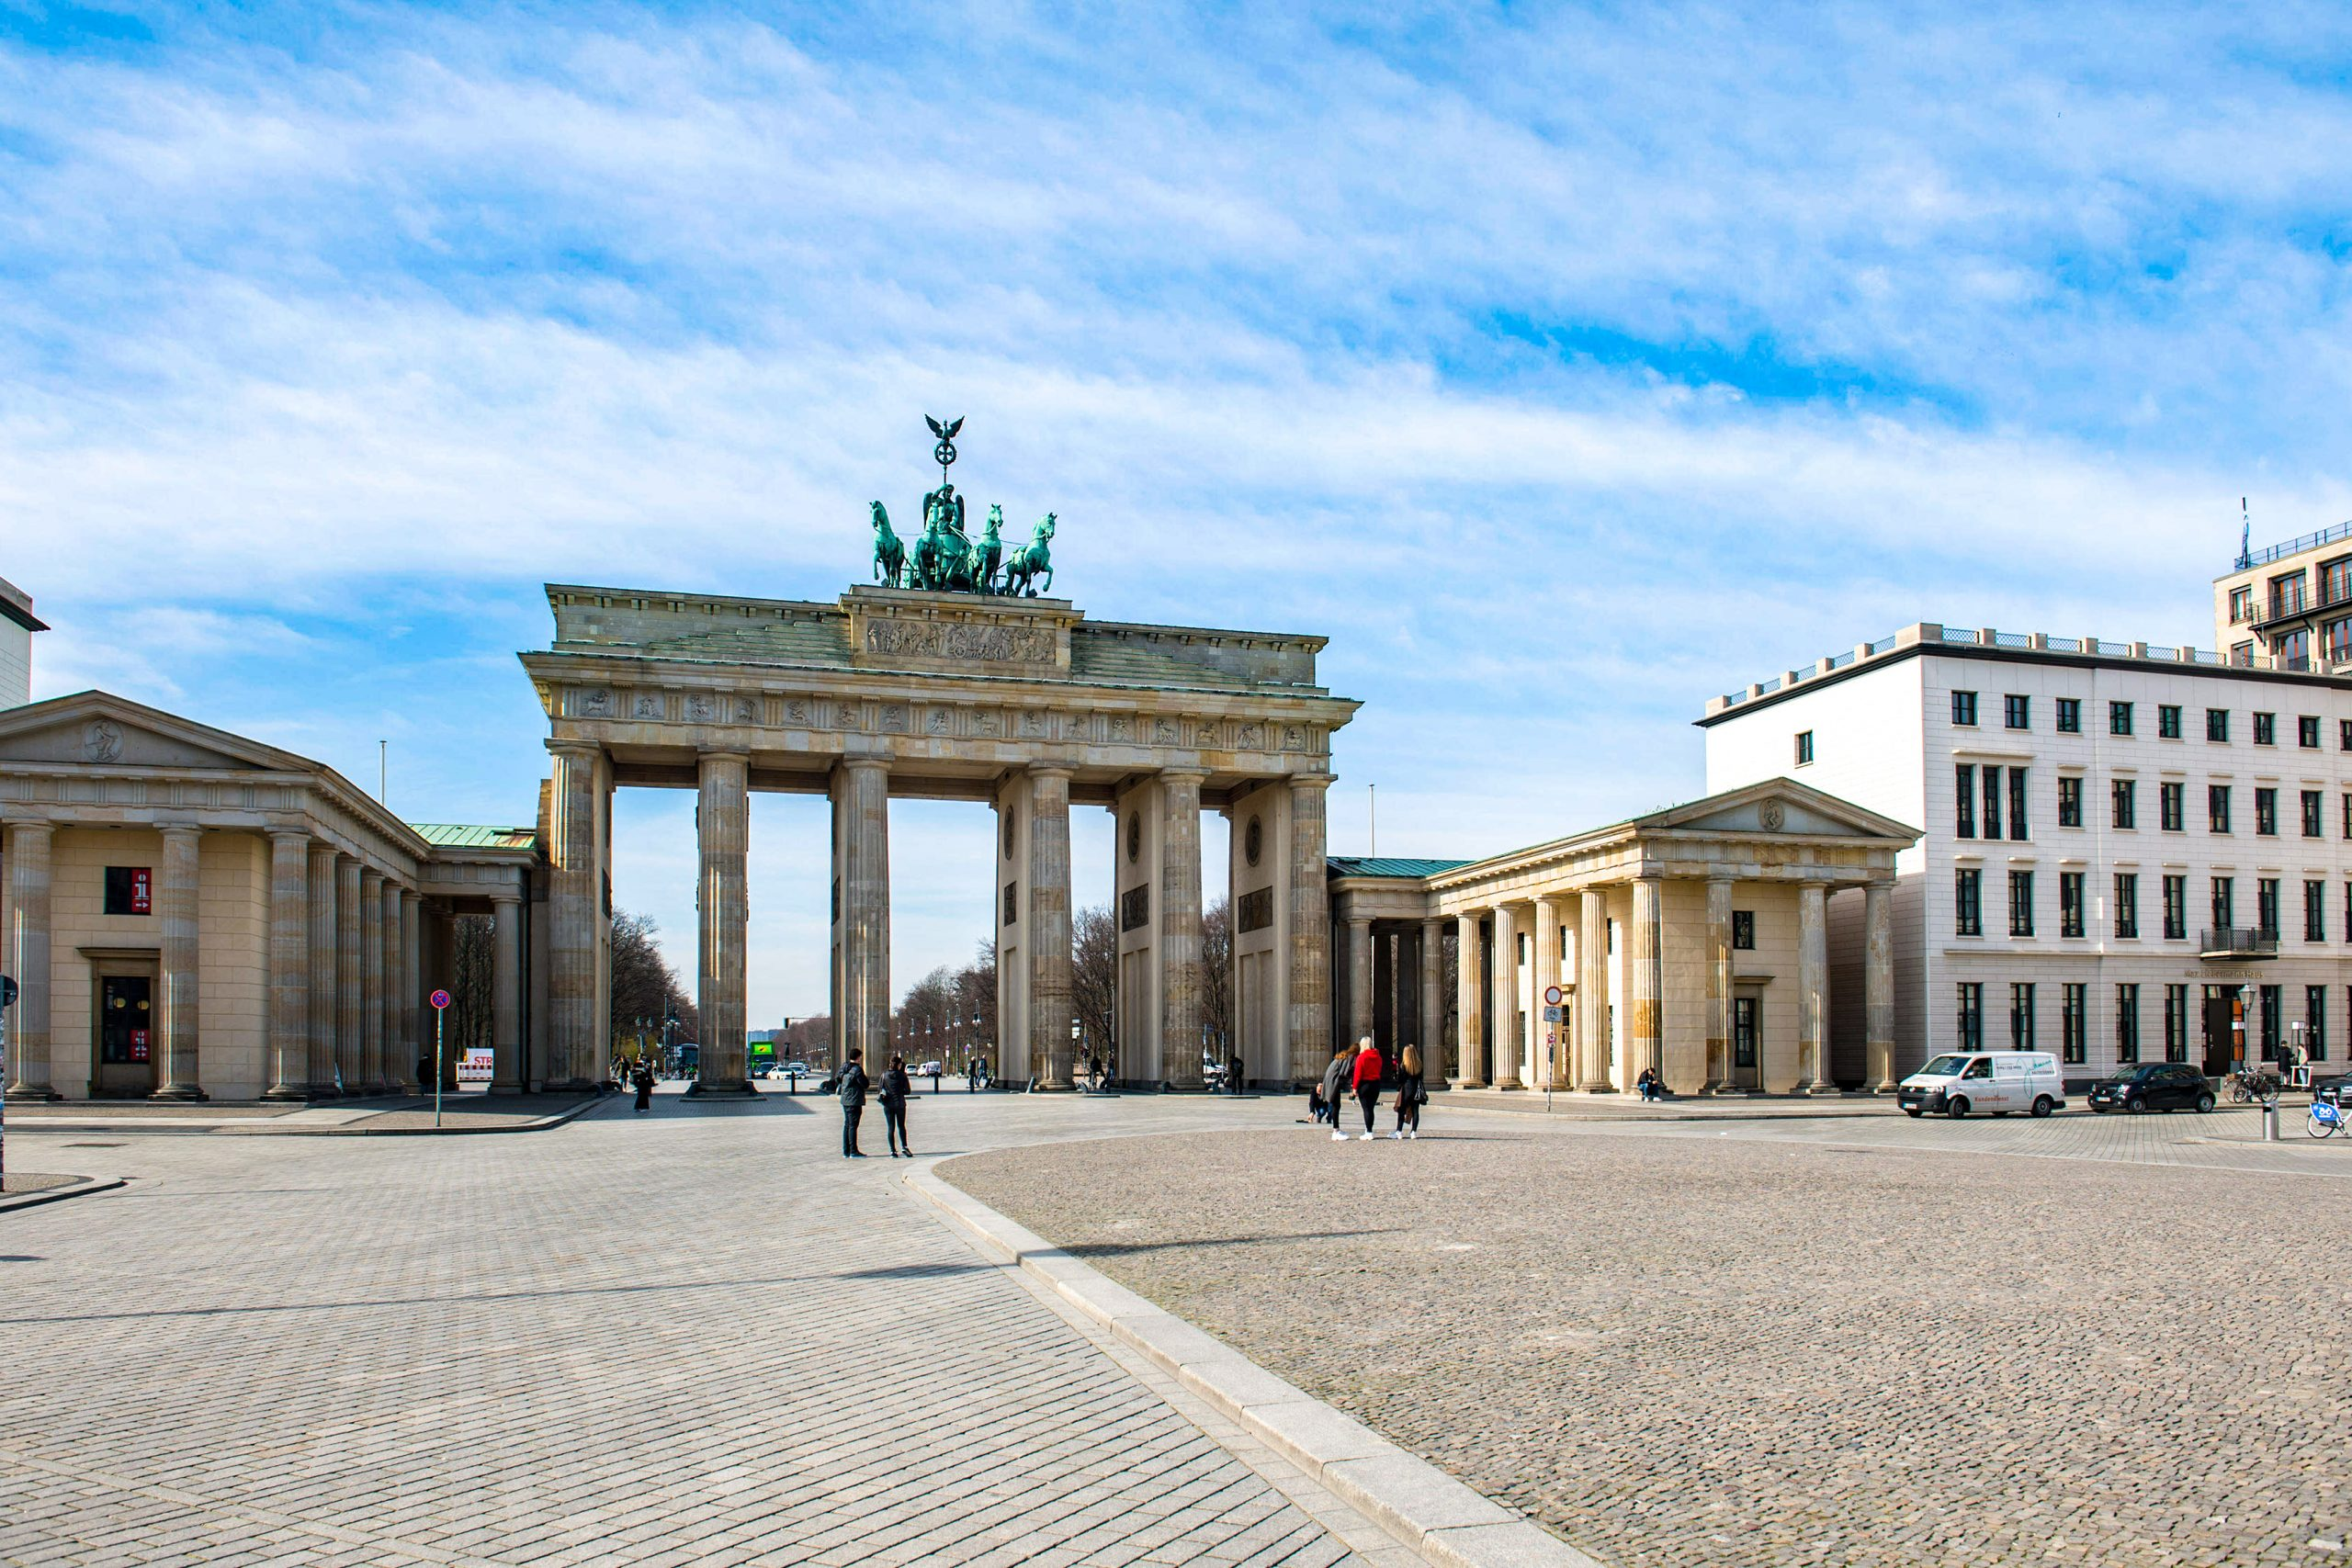 Corona In Berlin